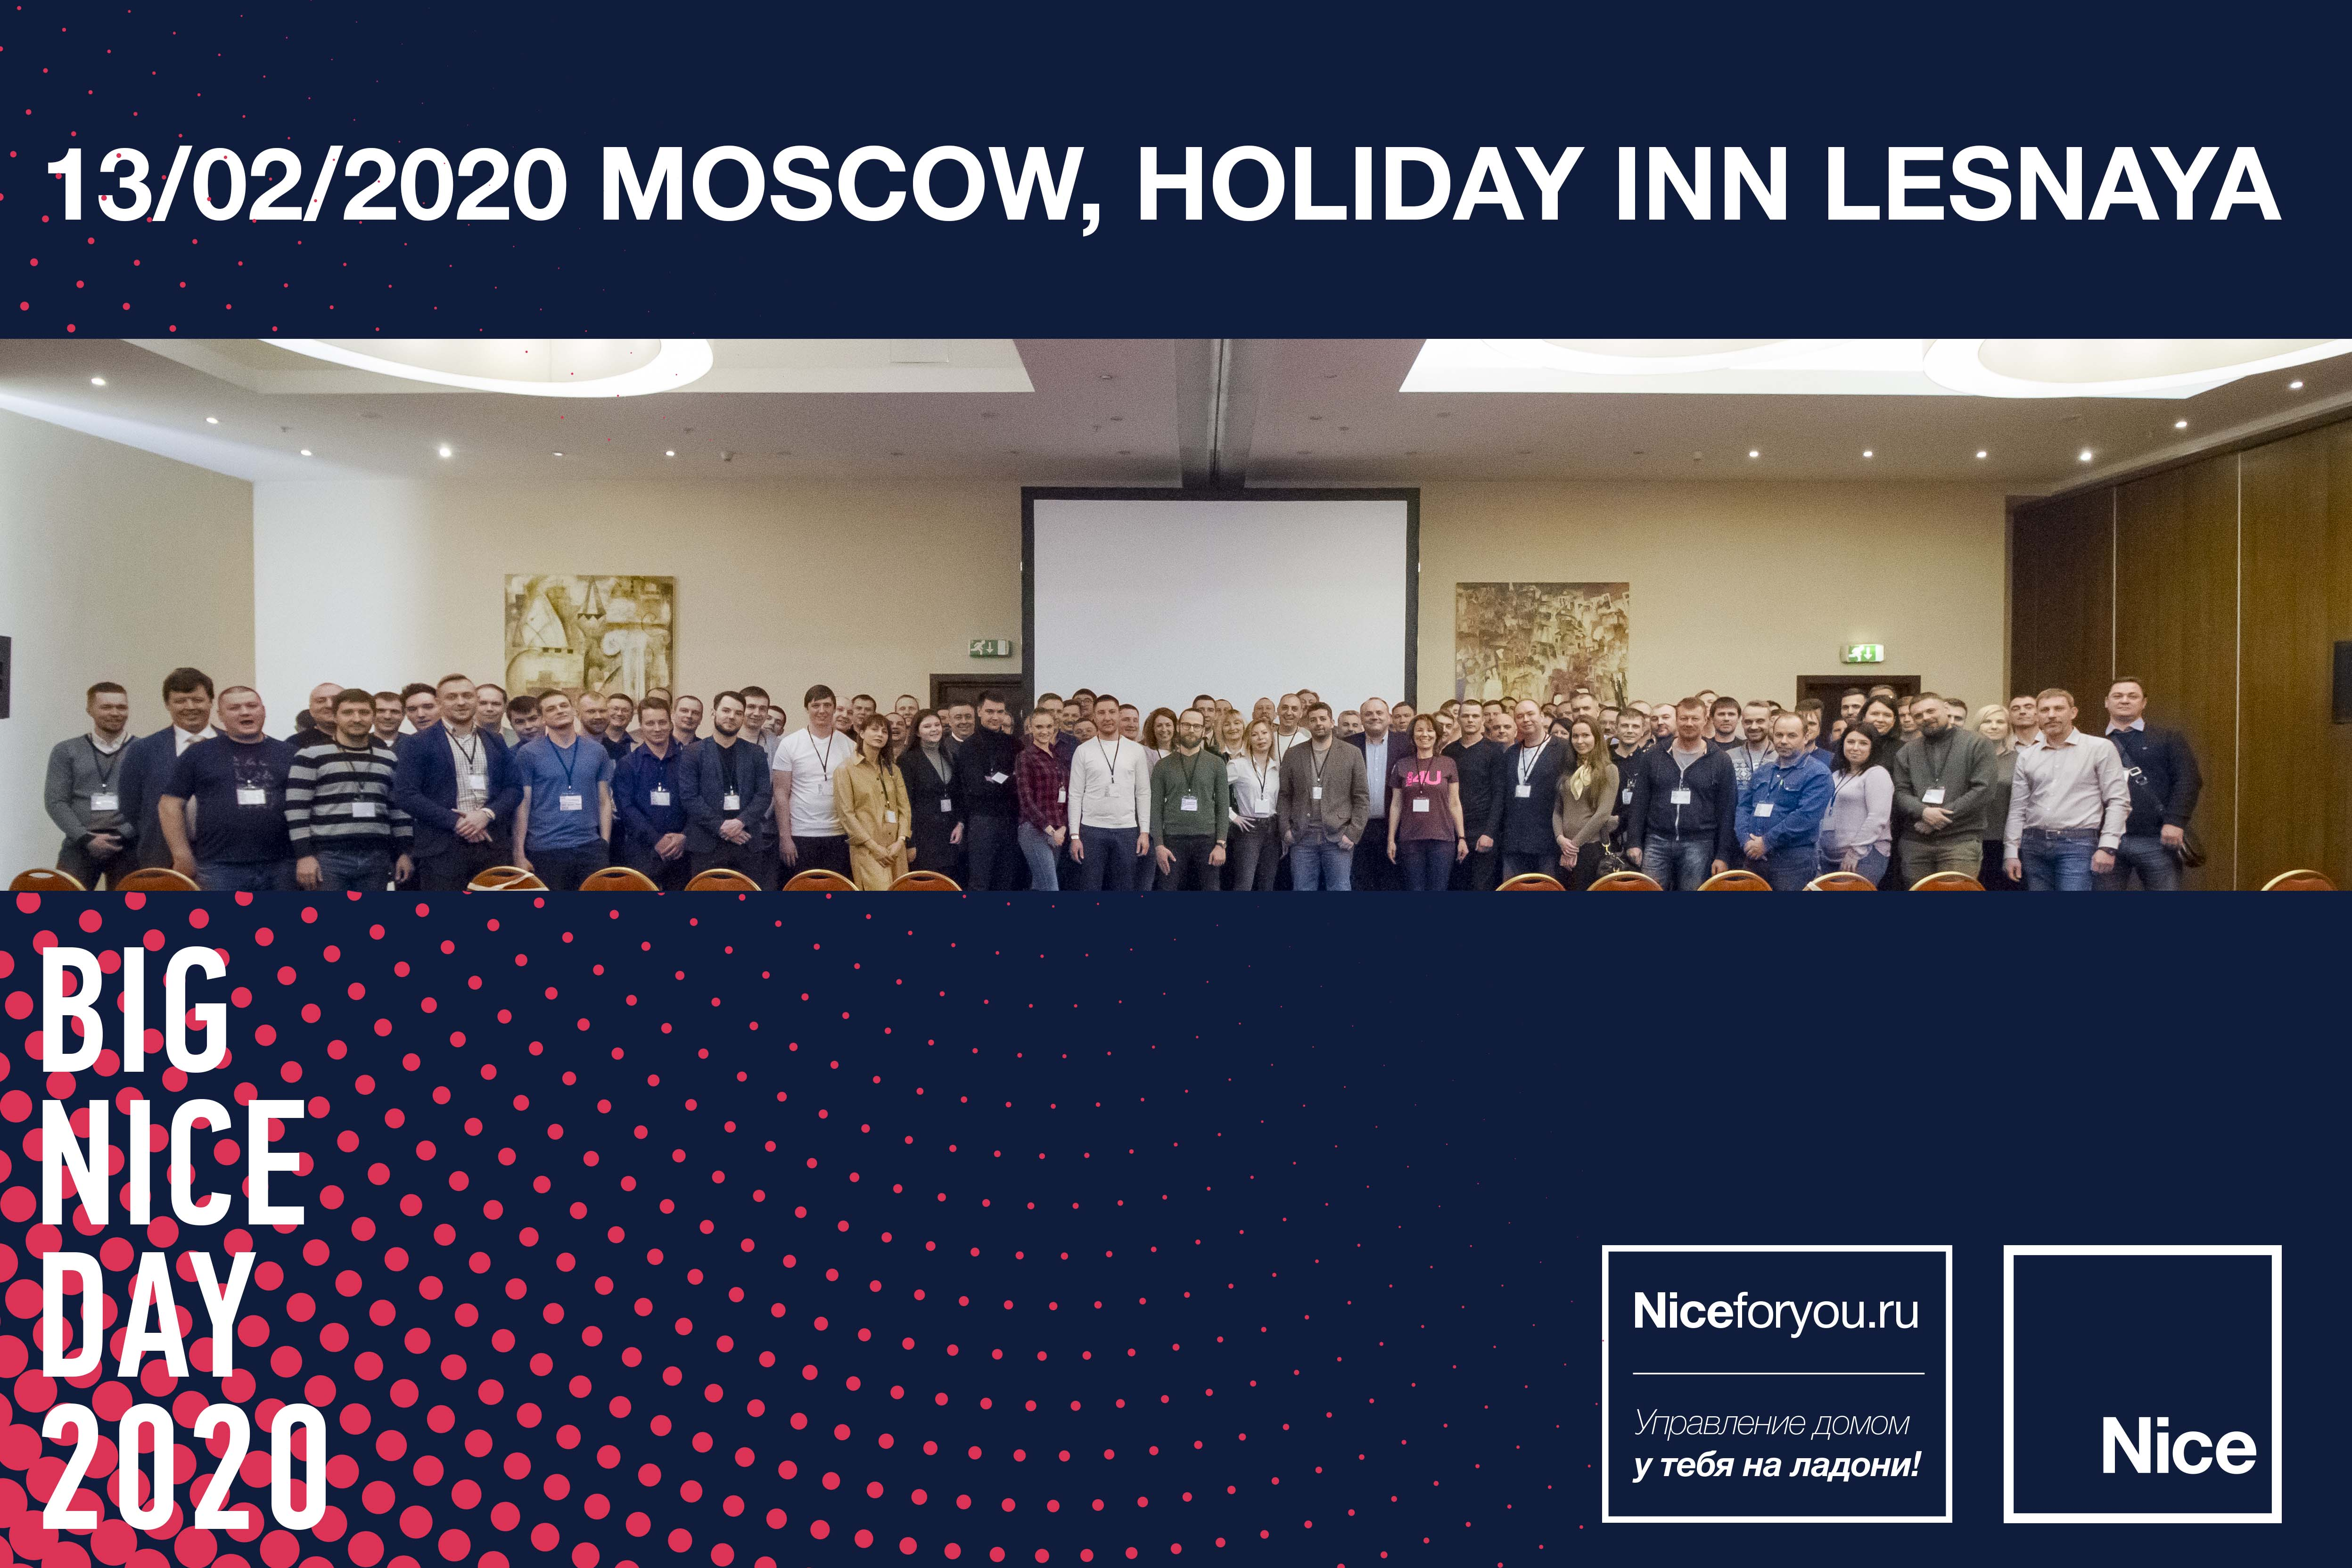 Big Nice Day Moscow 13/02/2020